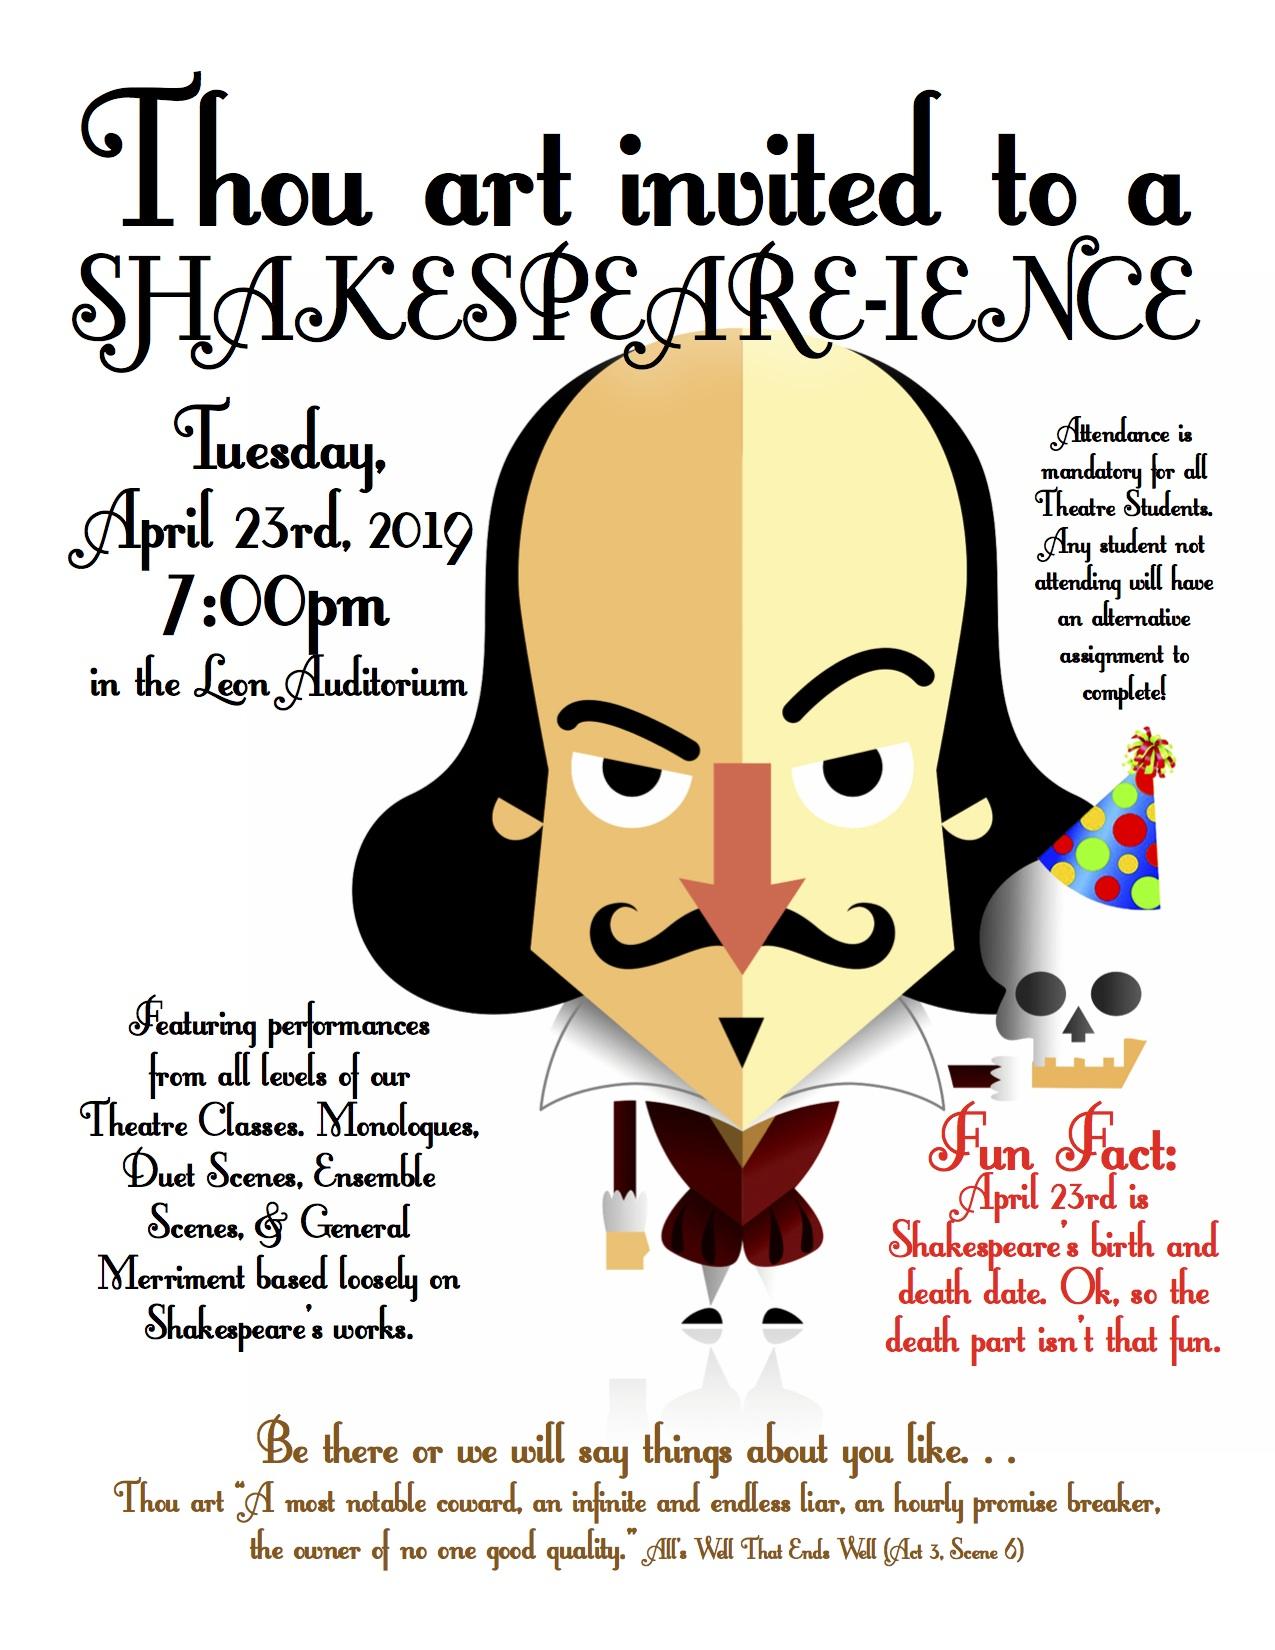 shakespeare-ience.jpg